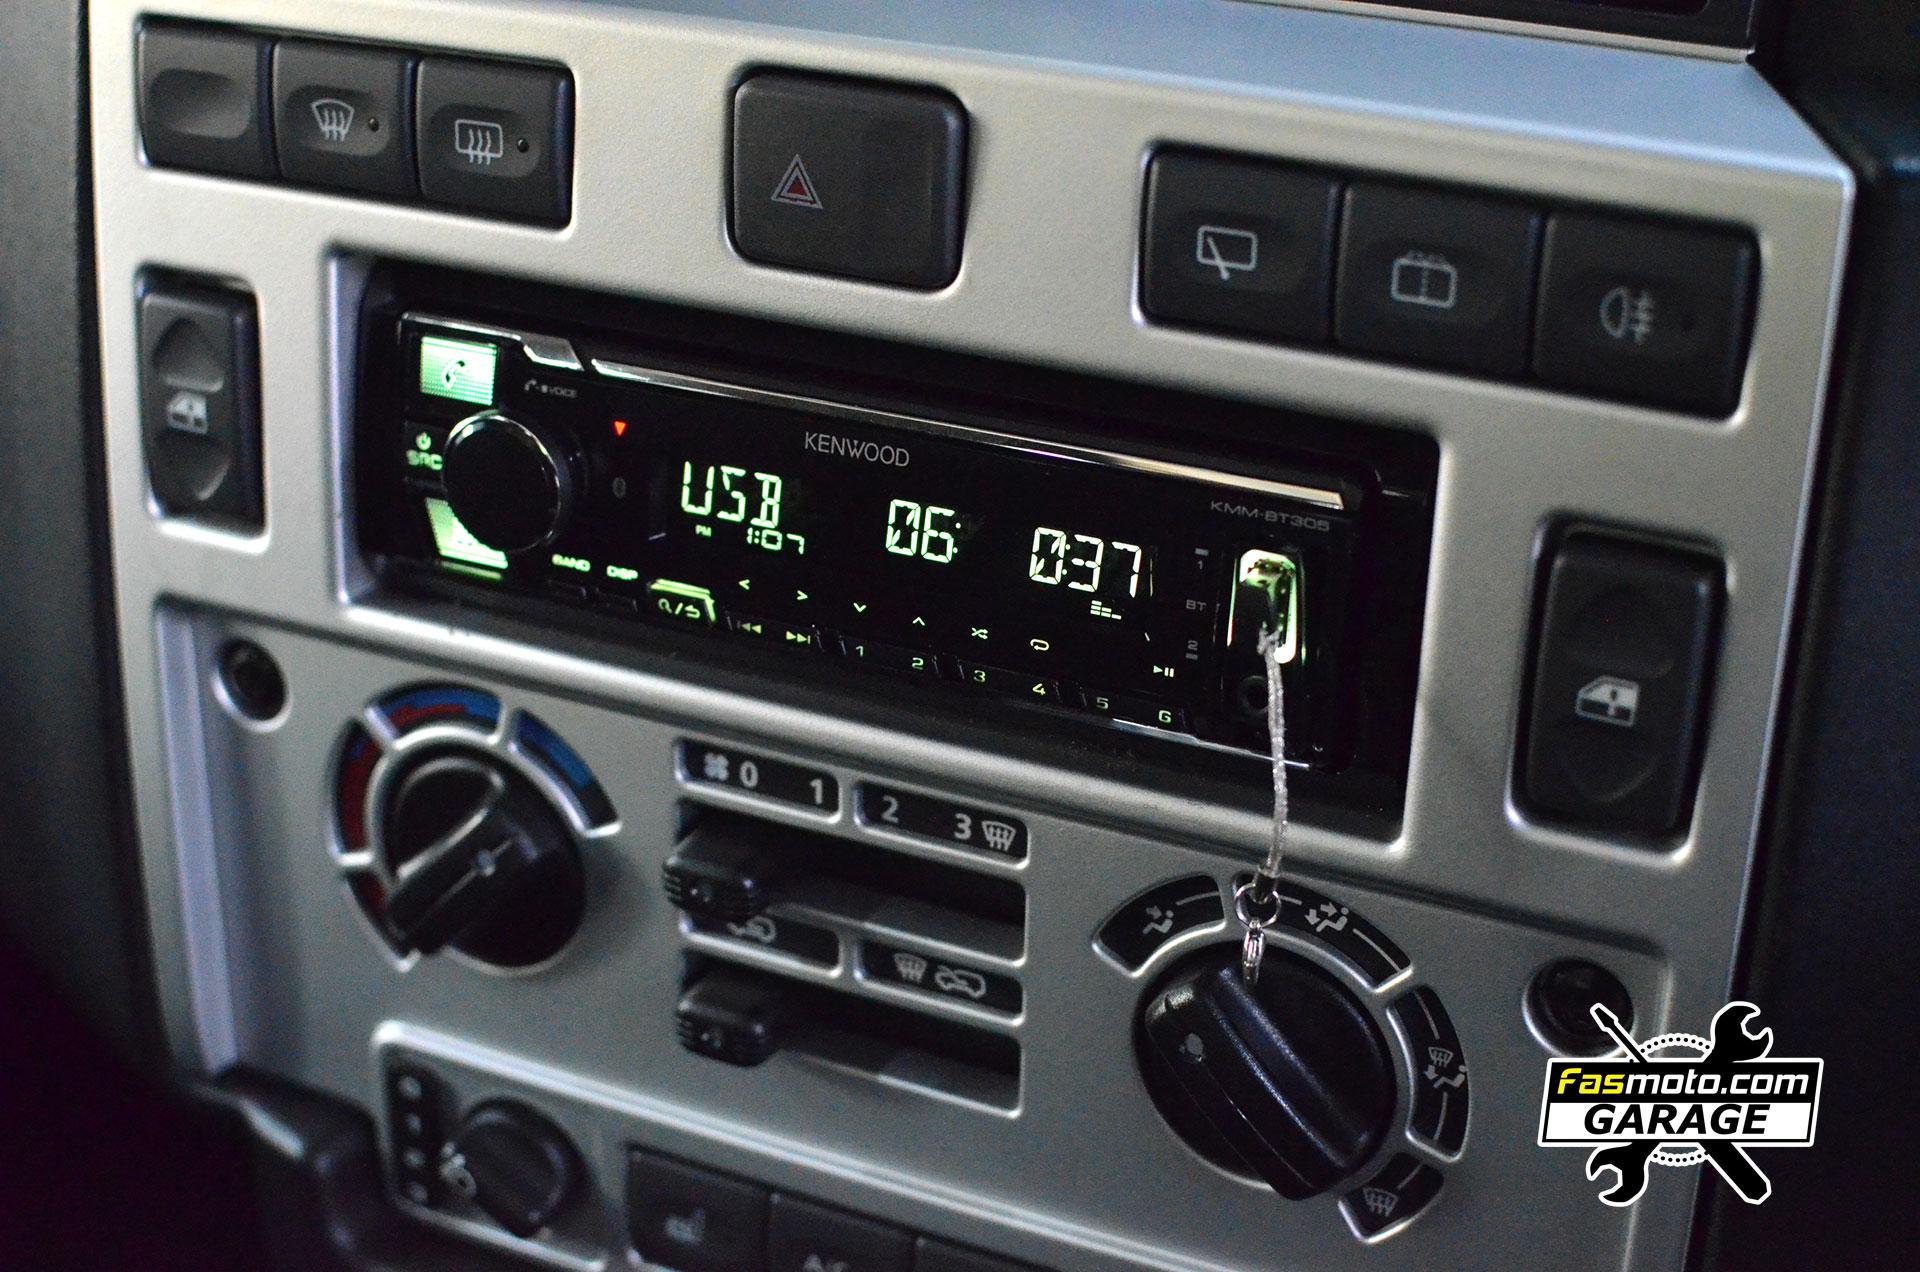 Land Rover Defender SVX Kenwood KMM BT305 Install